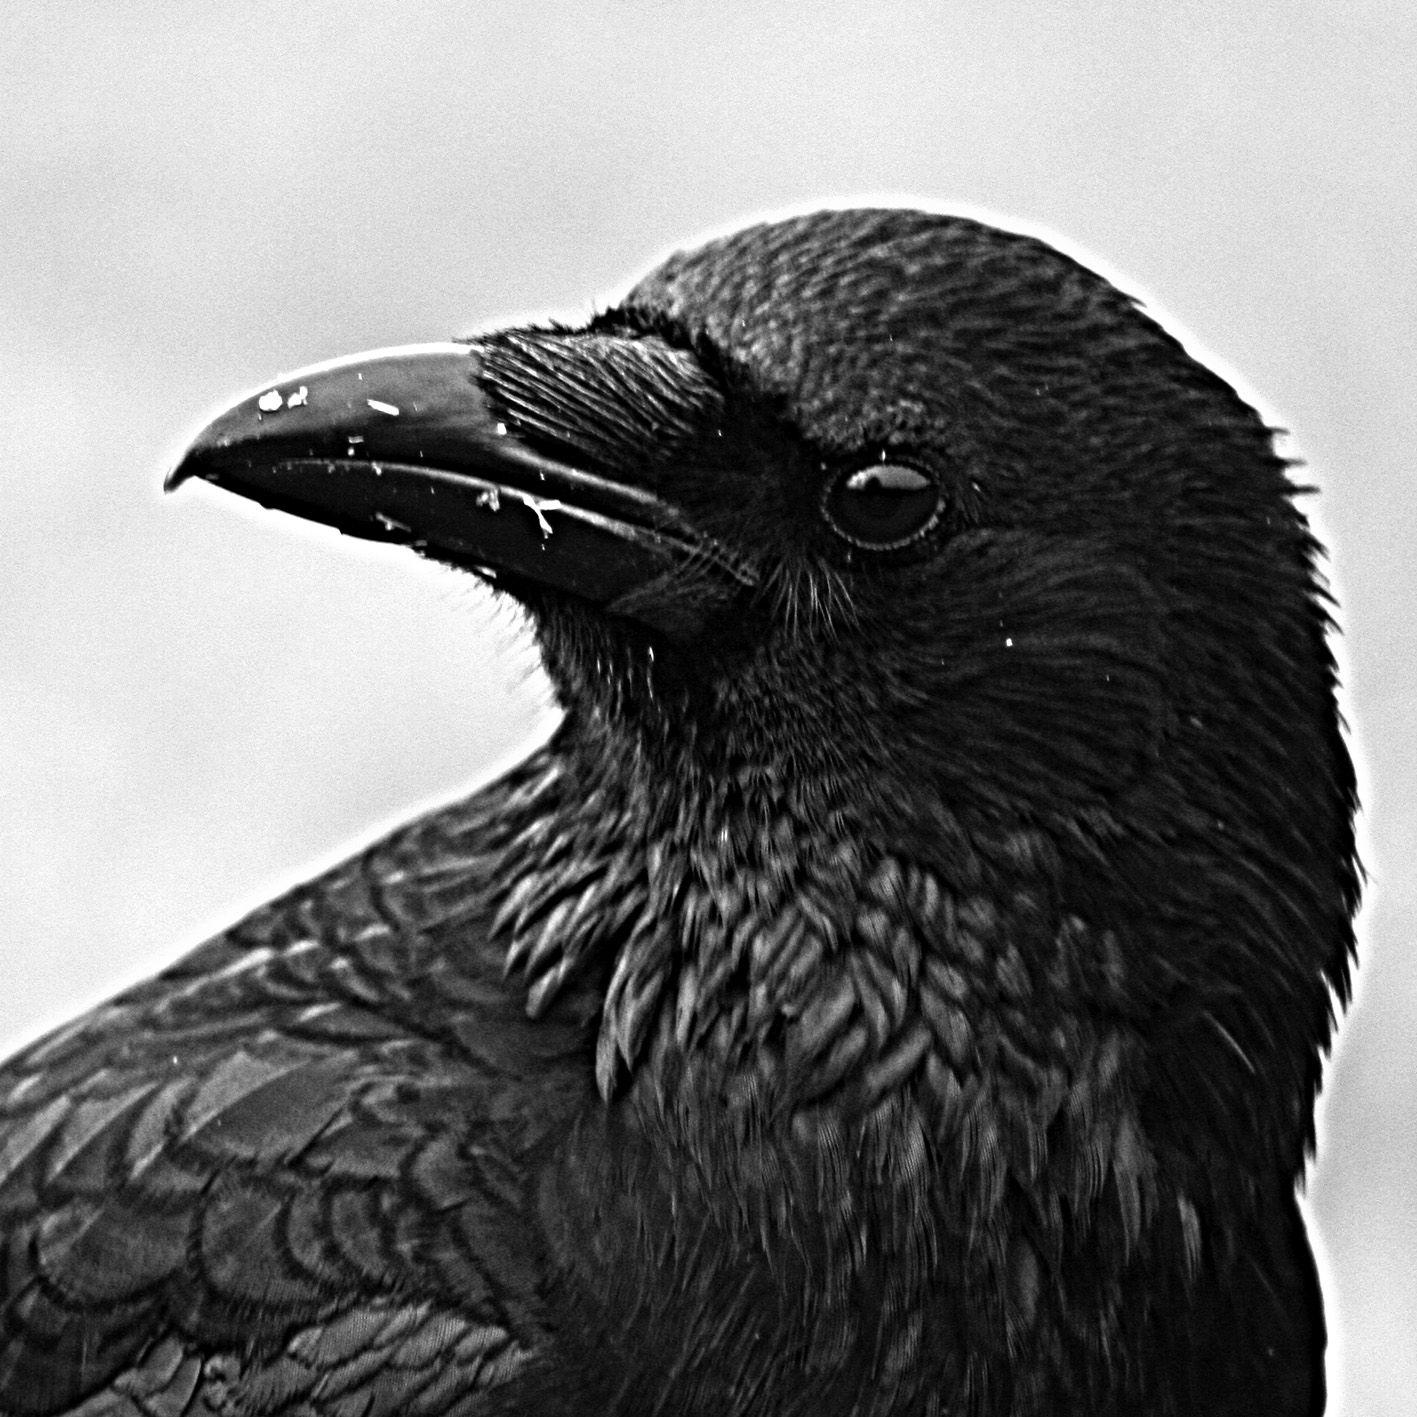 Carrion Crow Okehampton Devon Cuervo Hiperrealismo Aves